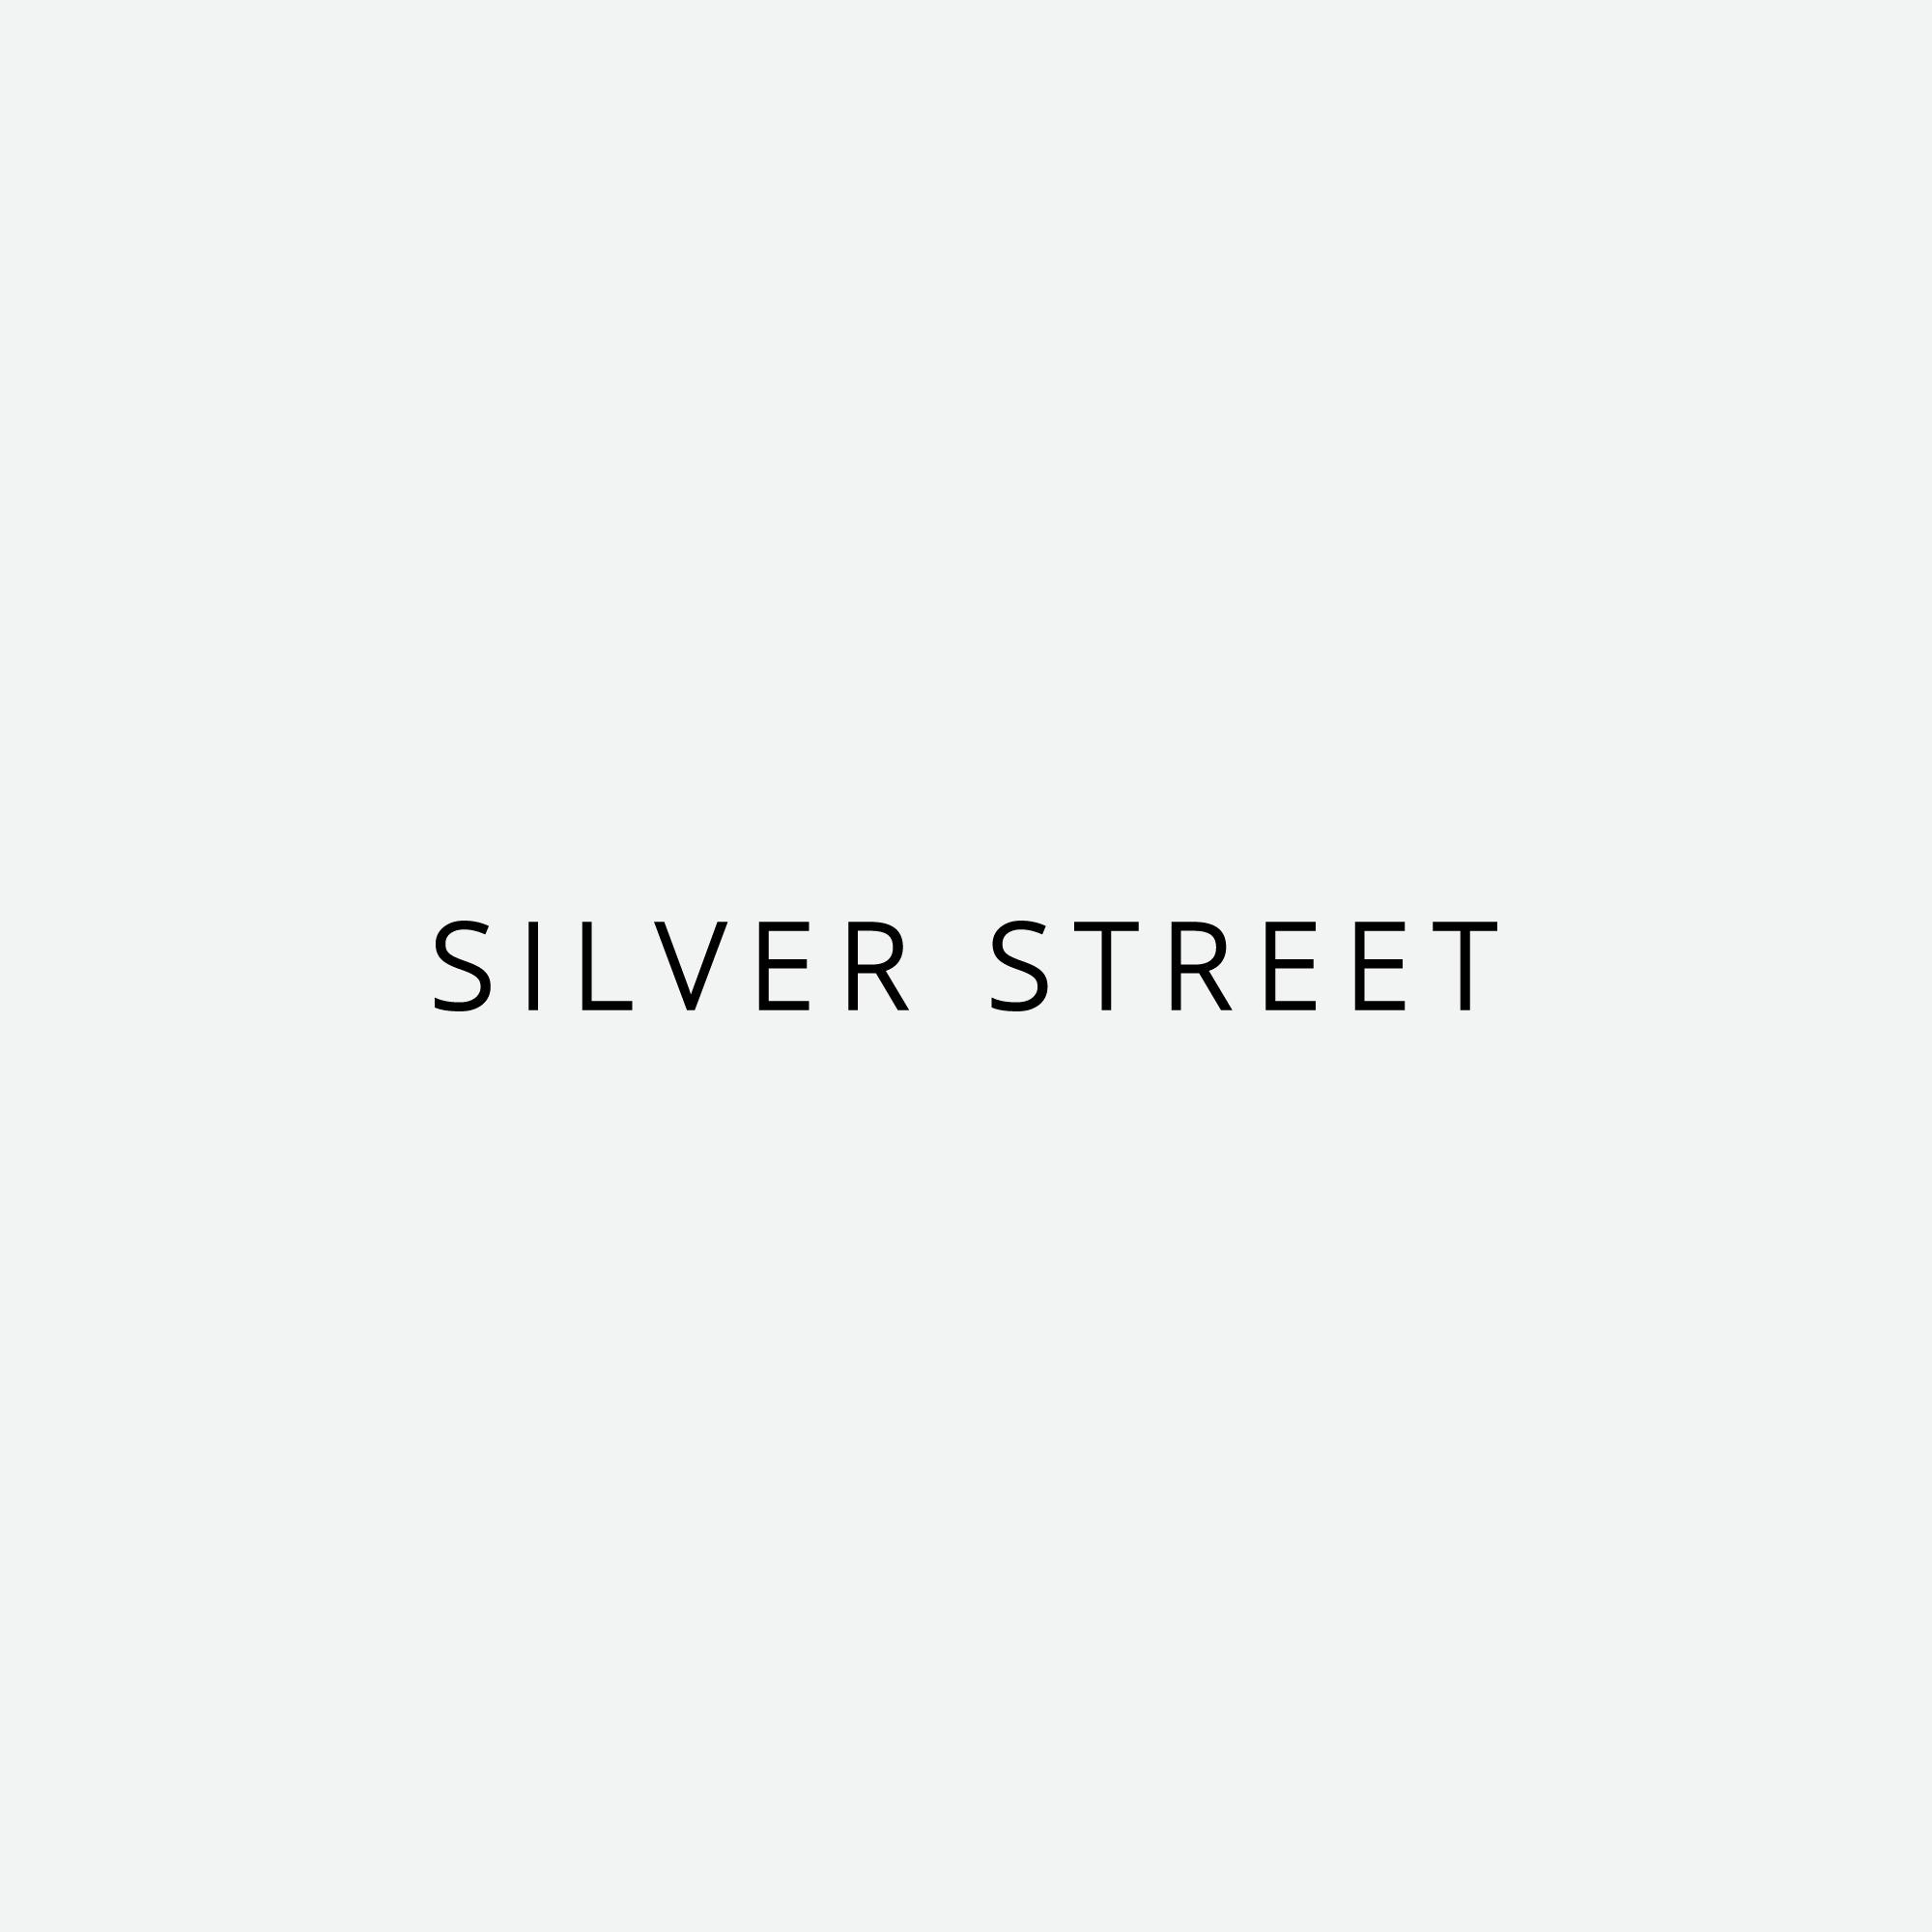 Silver Street - 2016